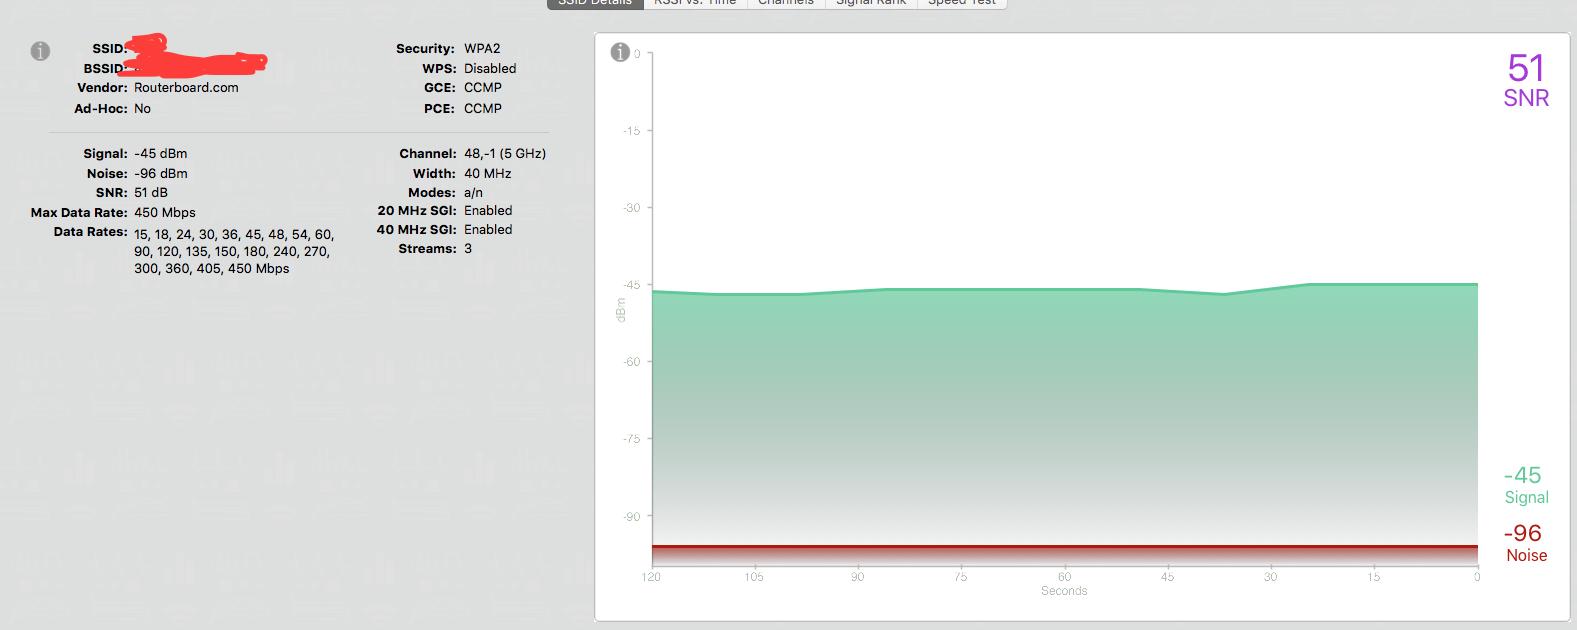 Wifi WLAN 5GHz trouble, Mikrotik, Bit rate tx 24 Mbit/s, 20-30 Mbit